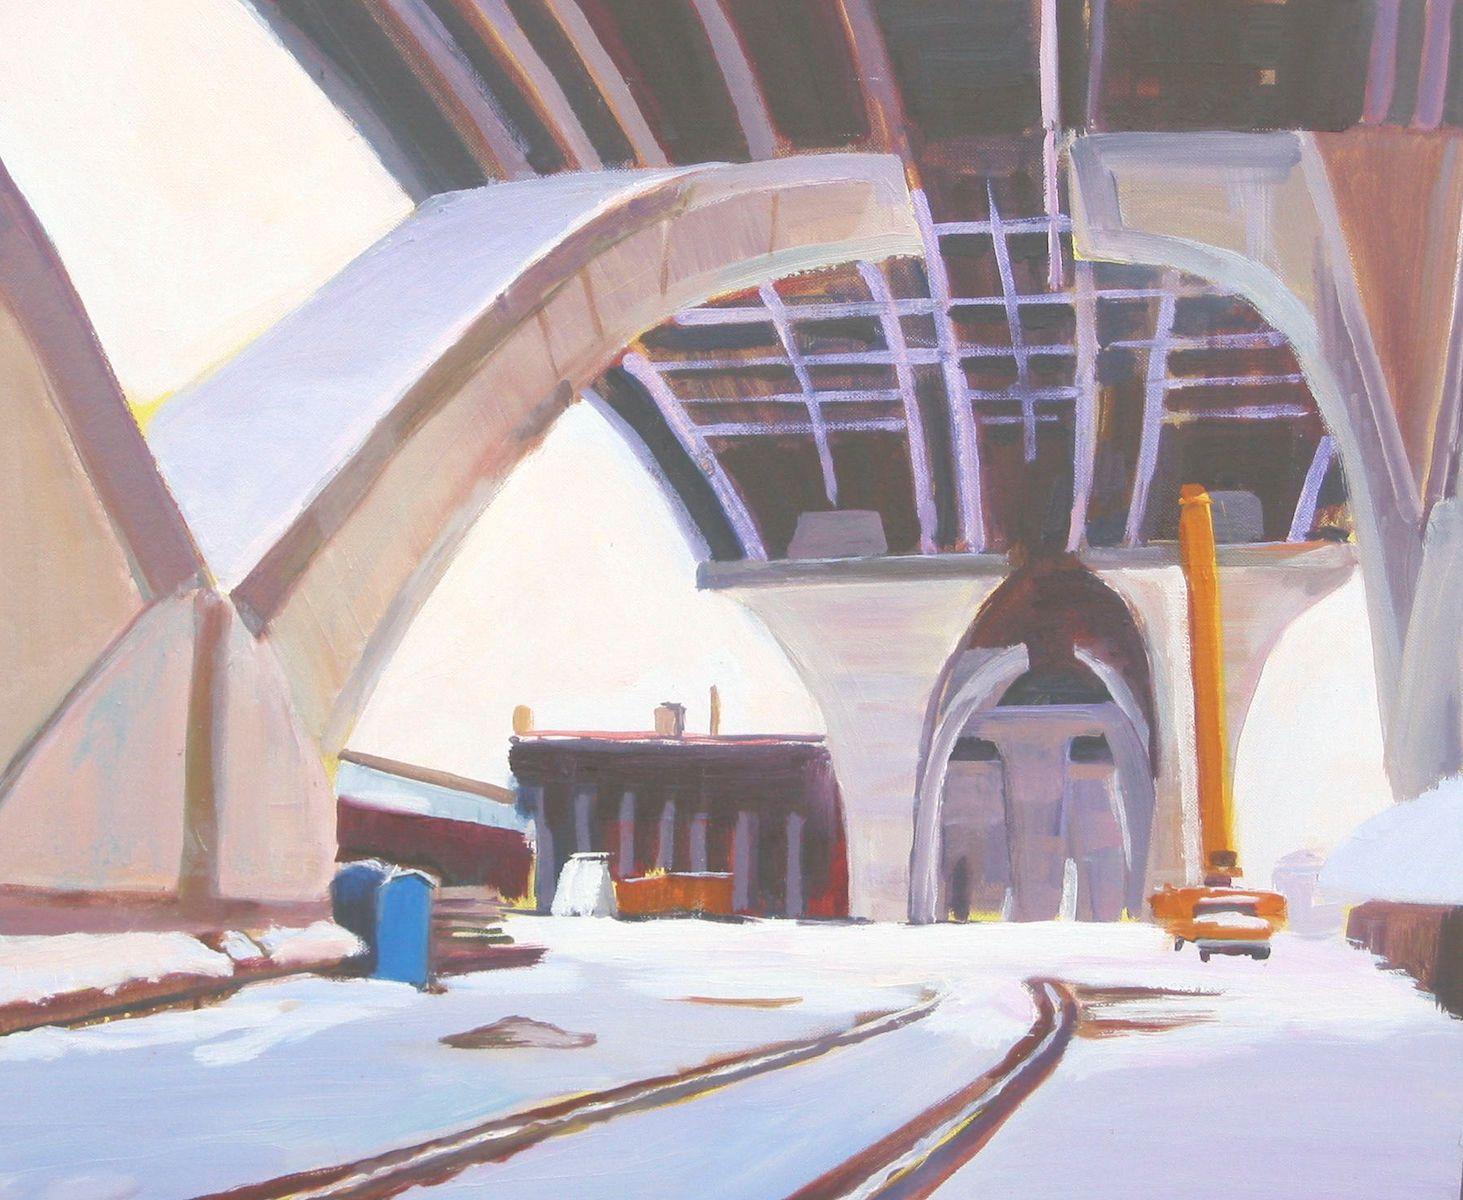 WILSON BRIDGE - SNOW III